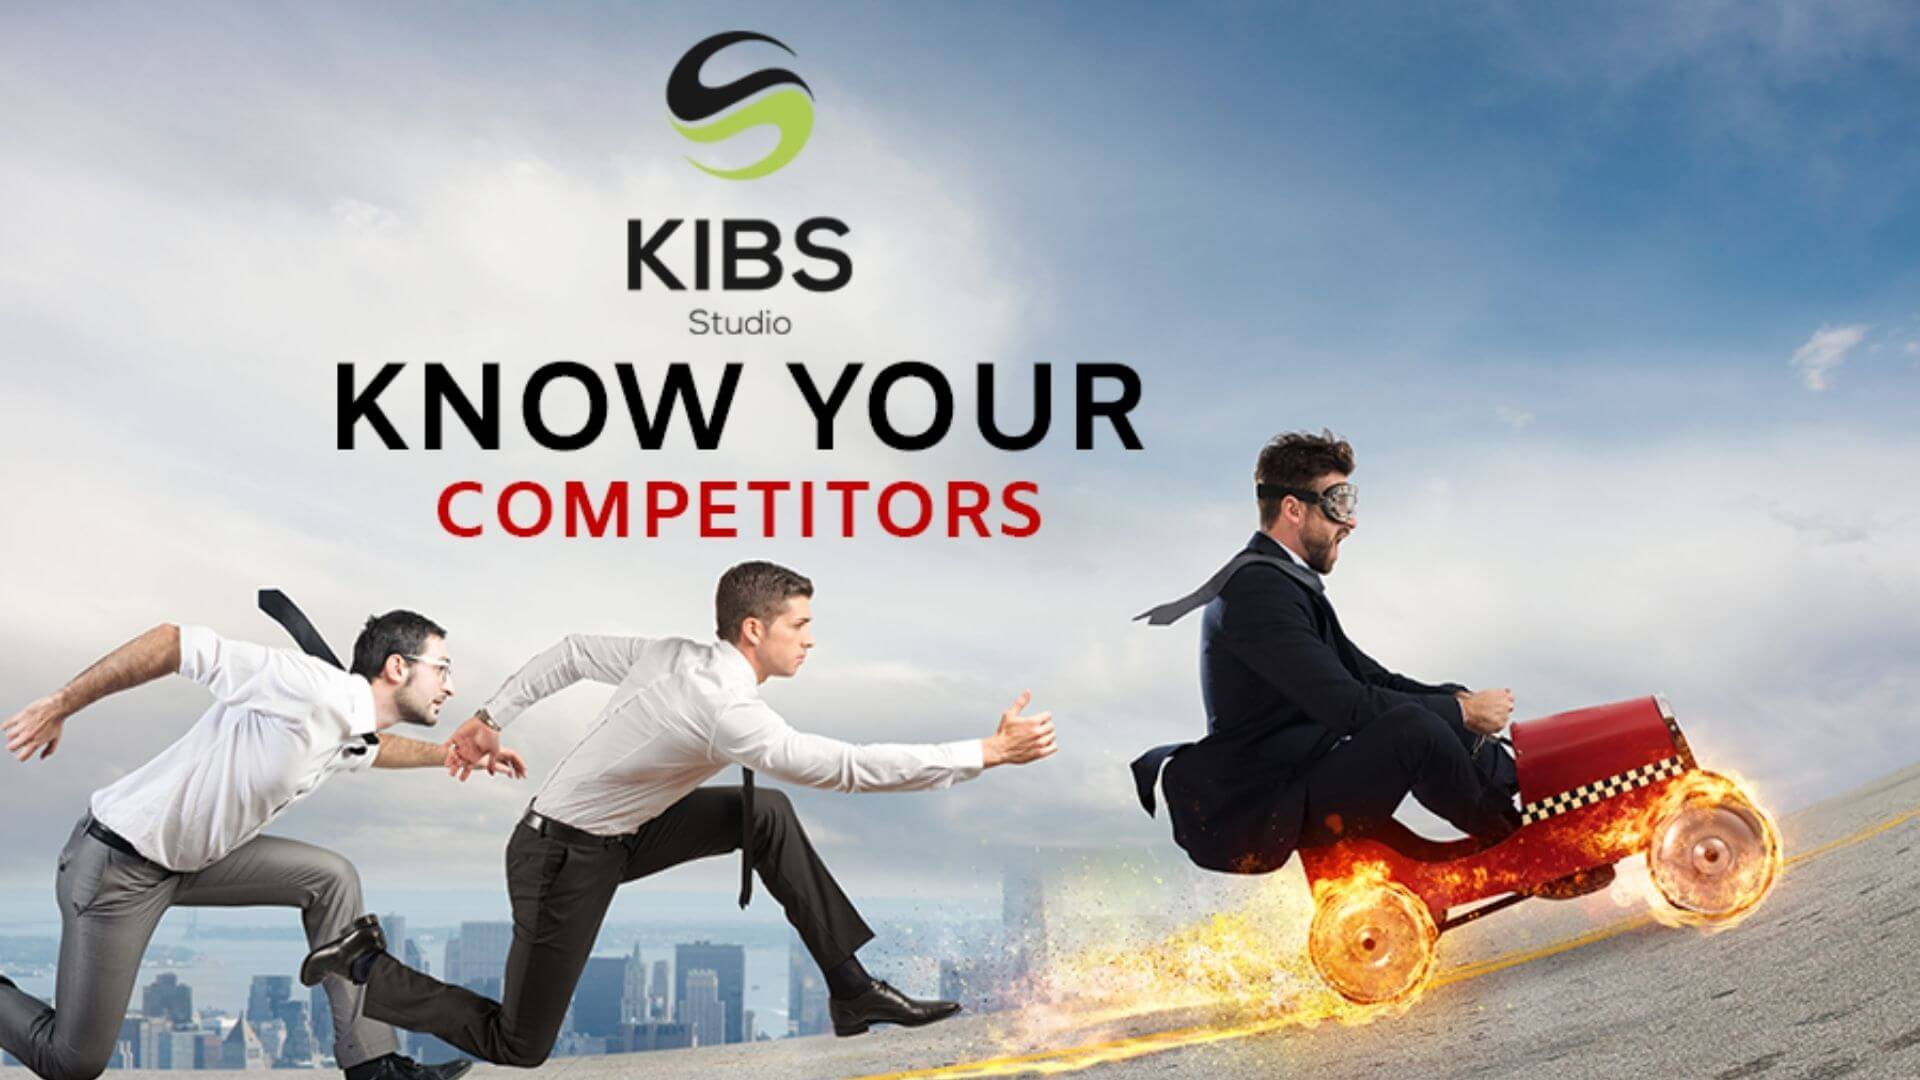 Analisi competitors KIBS Studio